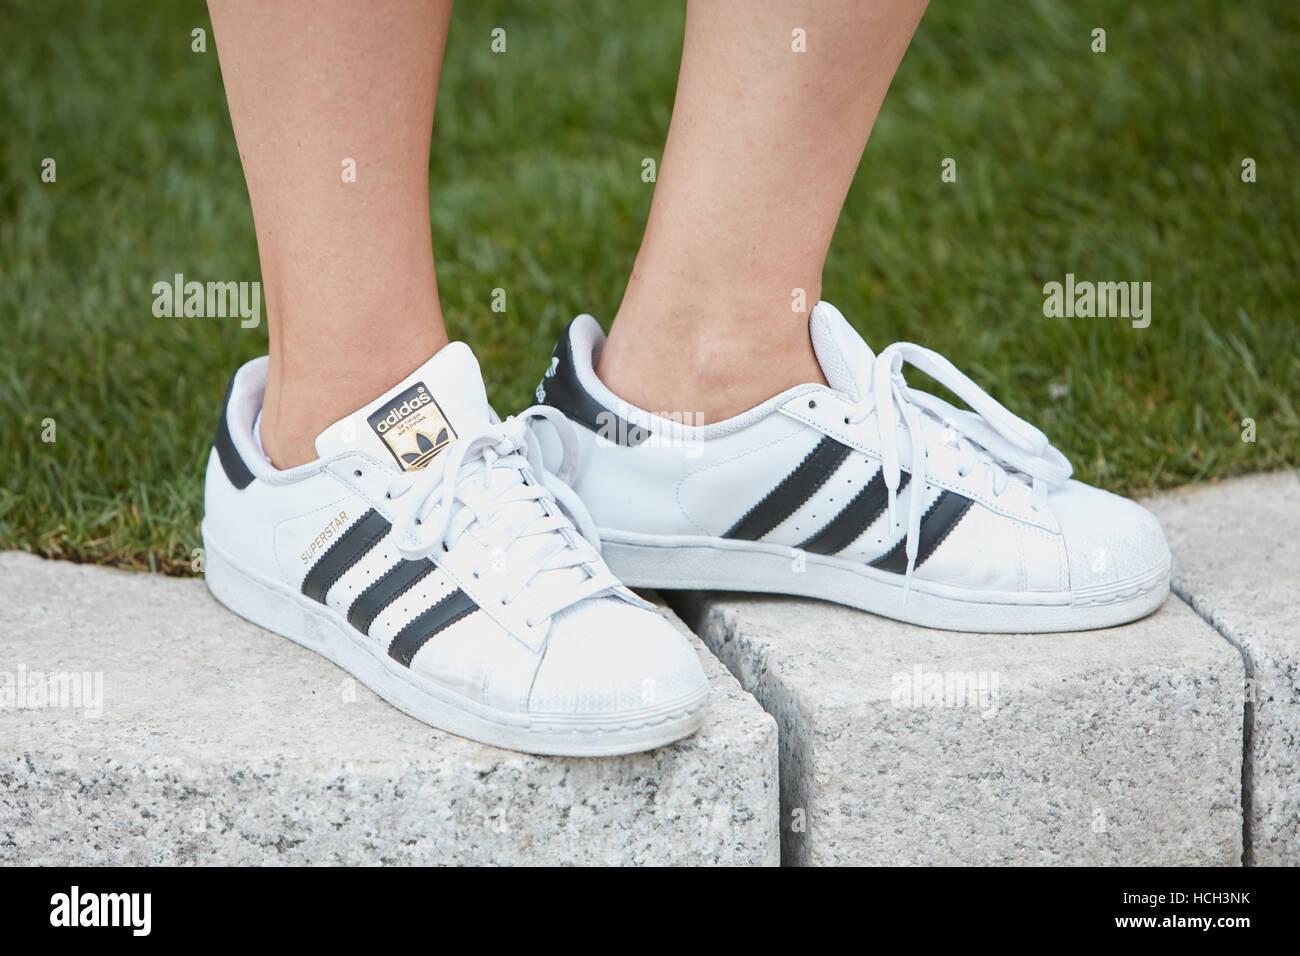 Avec Superstar Giorgio Avant Armani Femme De Adidas Chaussures Blanc Swwtd1